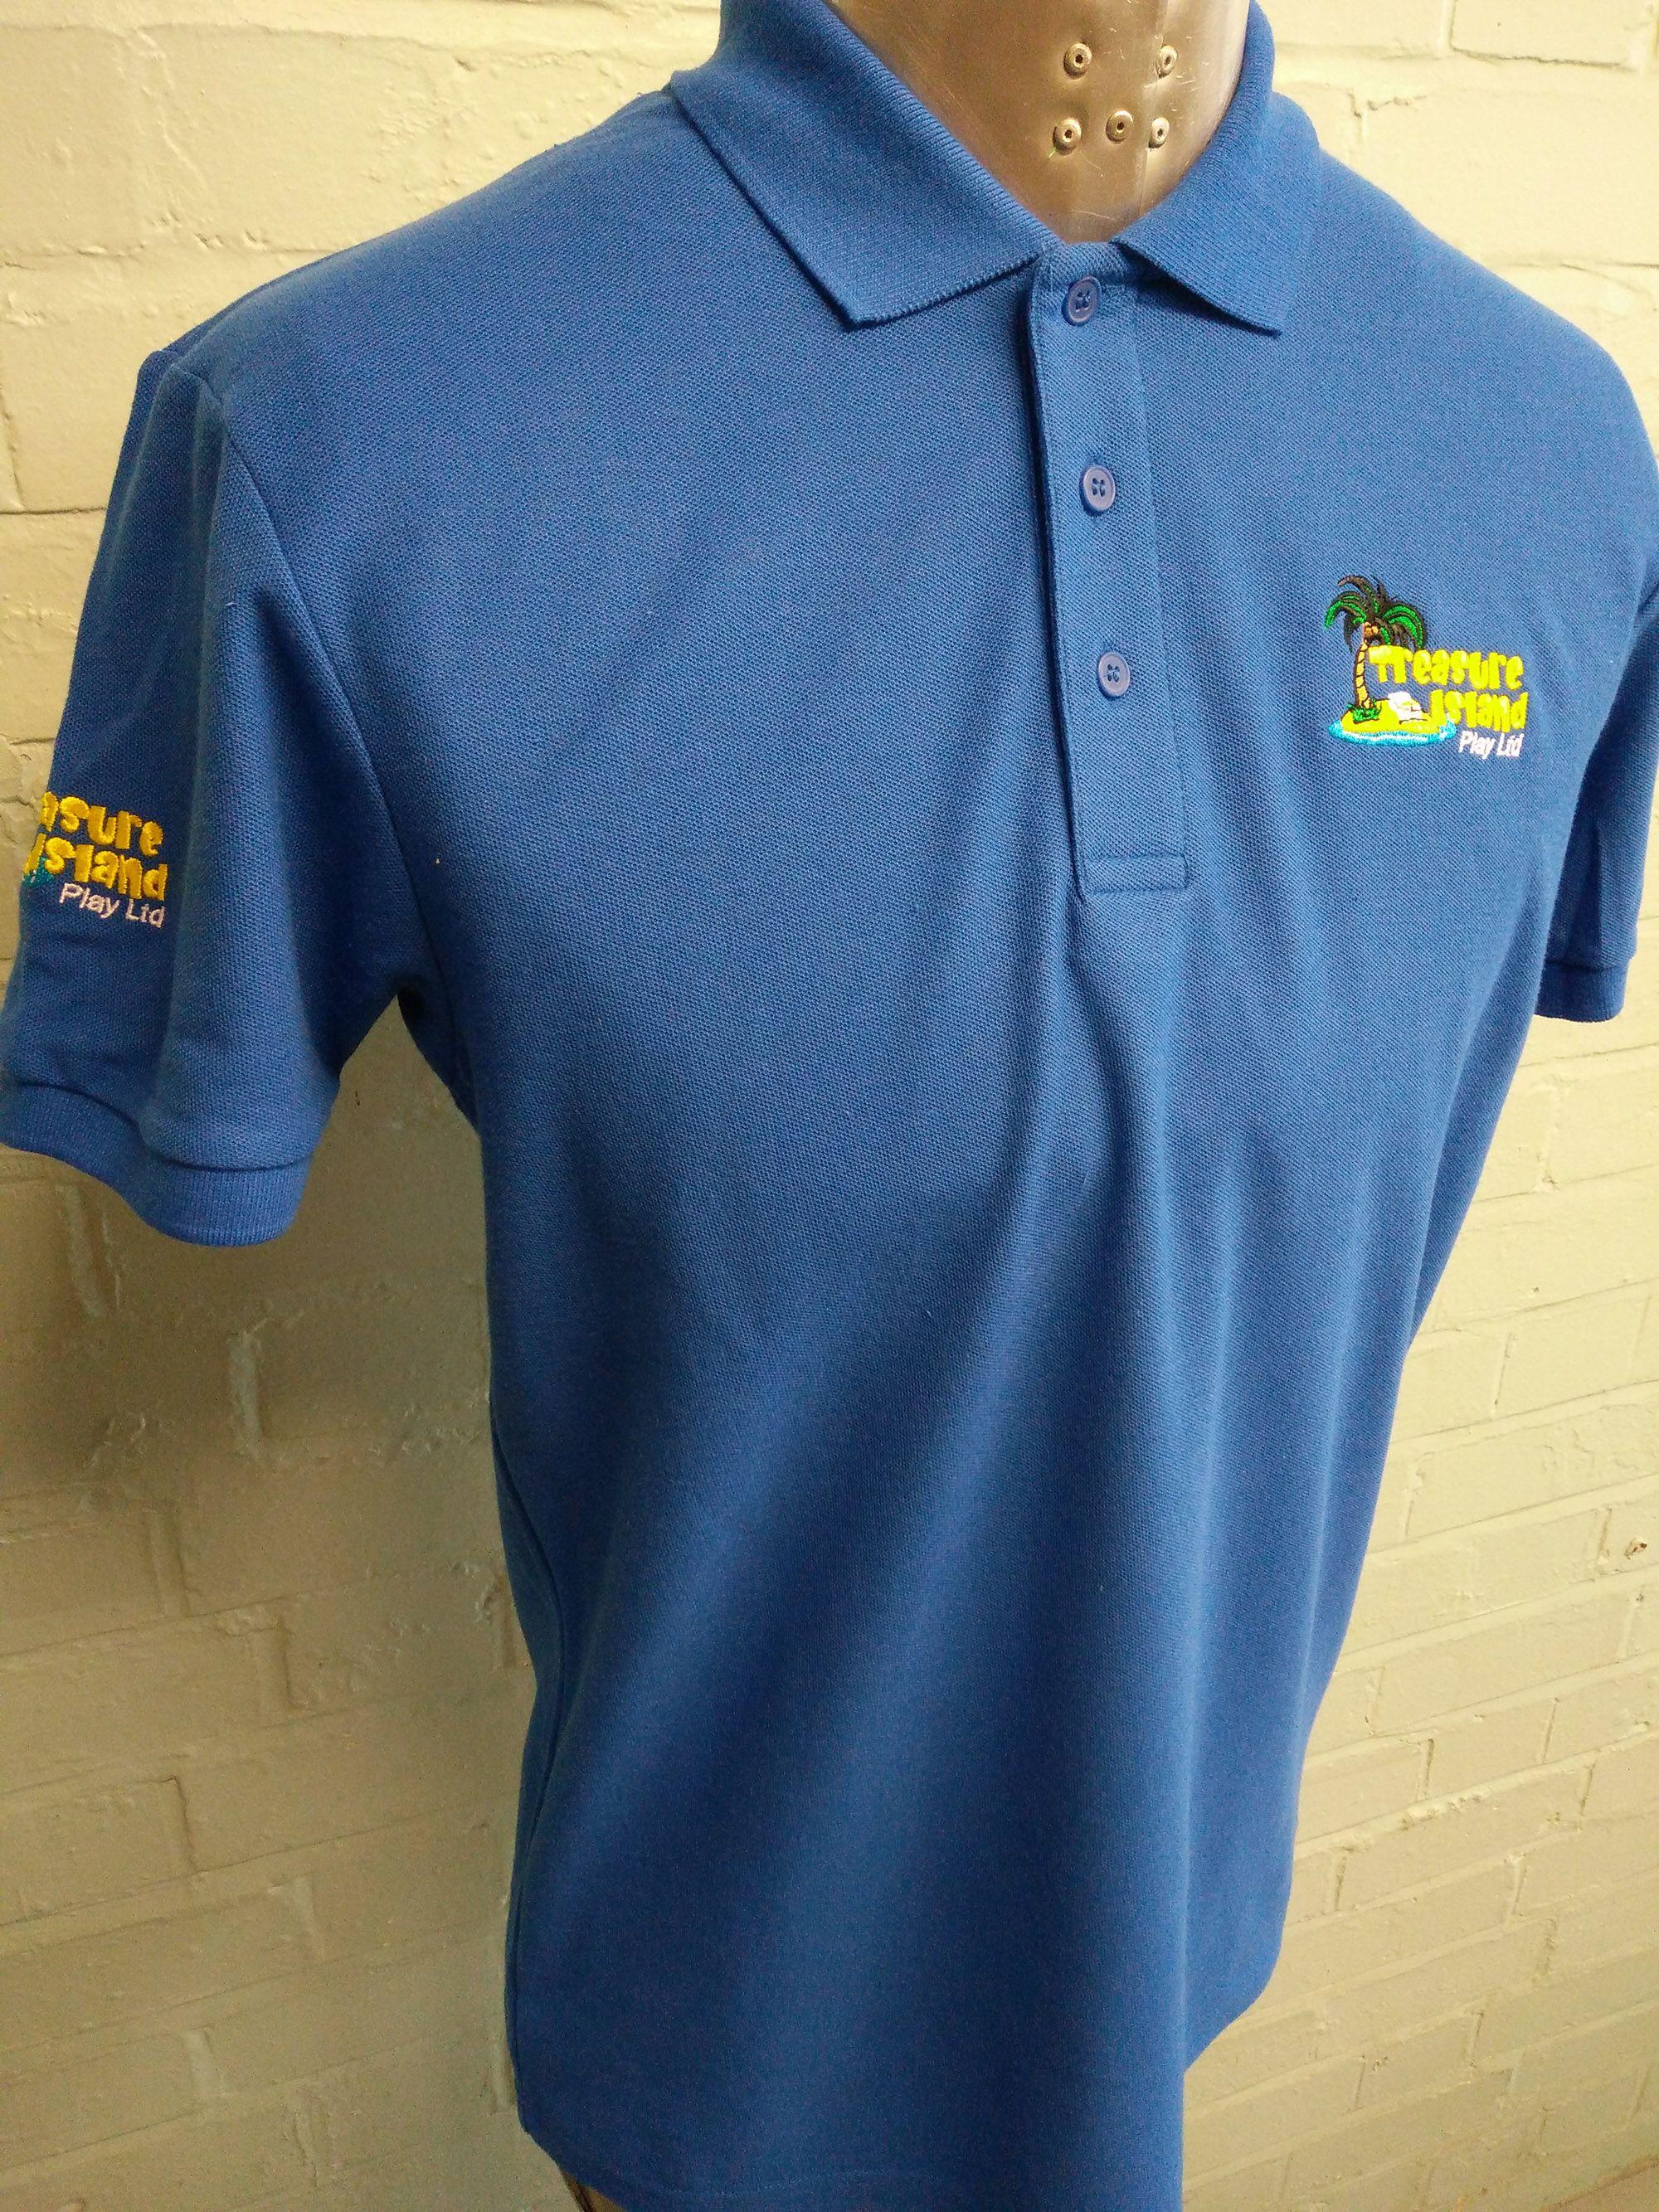 Workwear Polo T Shirts Looking Good For Treasure Island Play Ltd